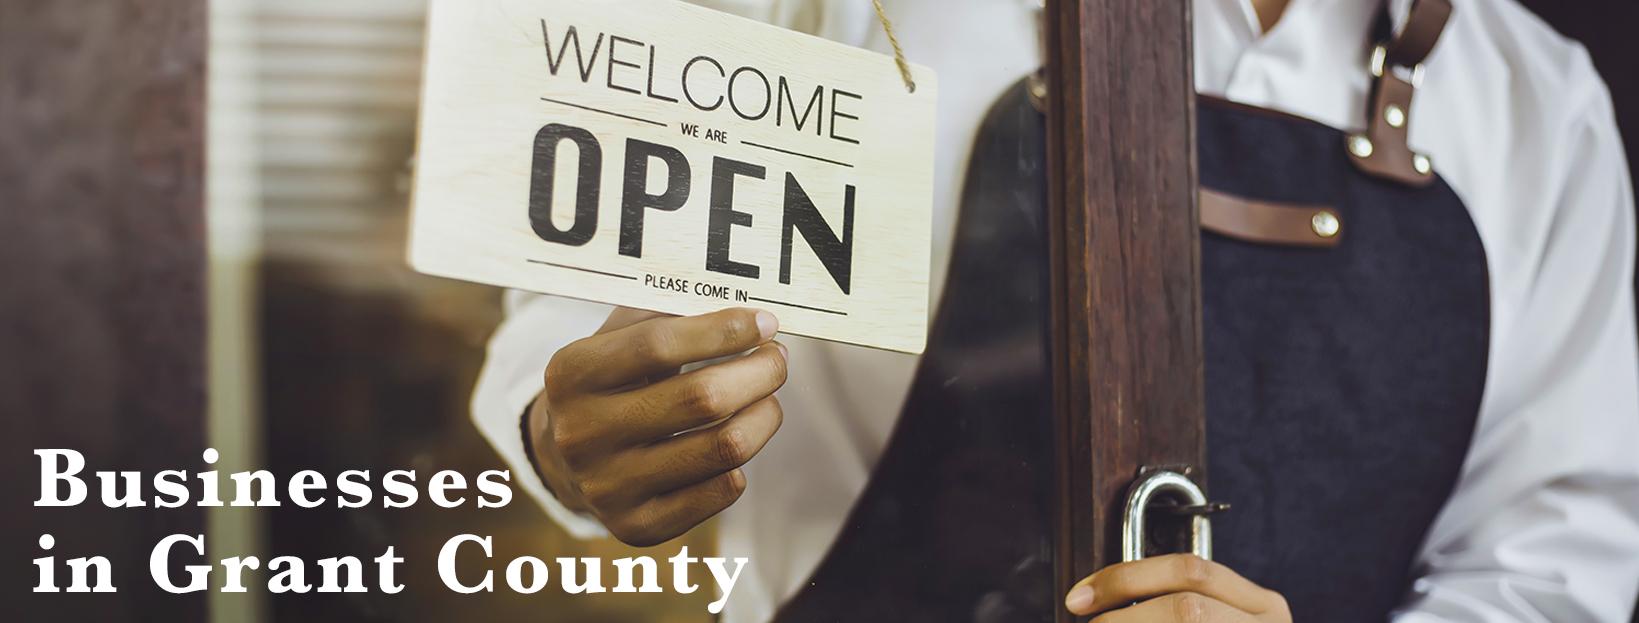 Grant County OPEN